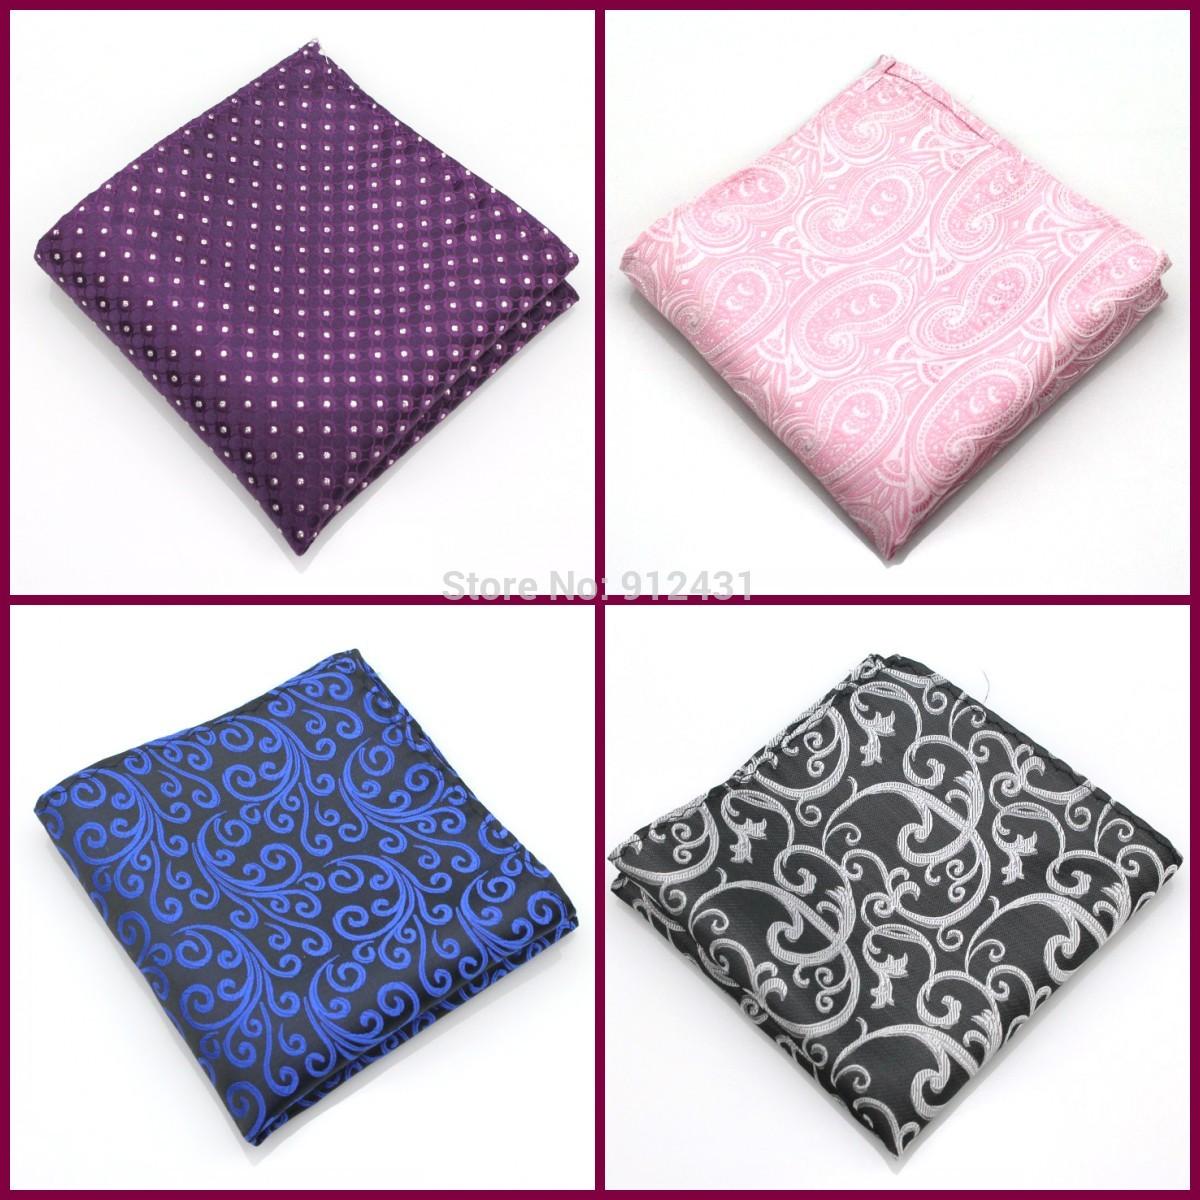 50 colors available! Wholesale fashion design polyester men pocket squares handkerchief men hanky free shipping 30pcs #0547(China (Mainland))